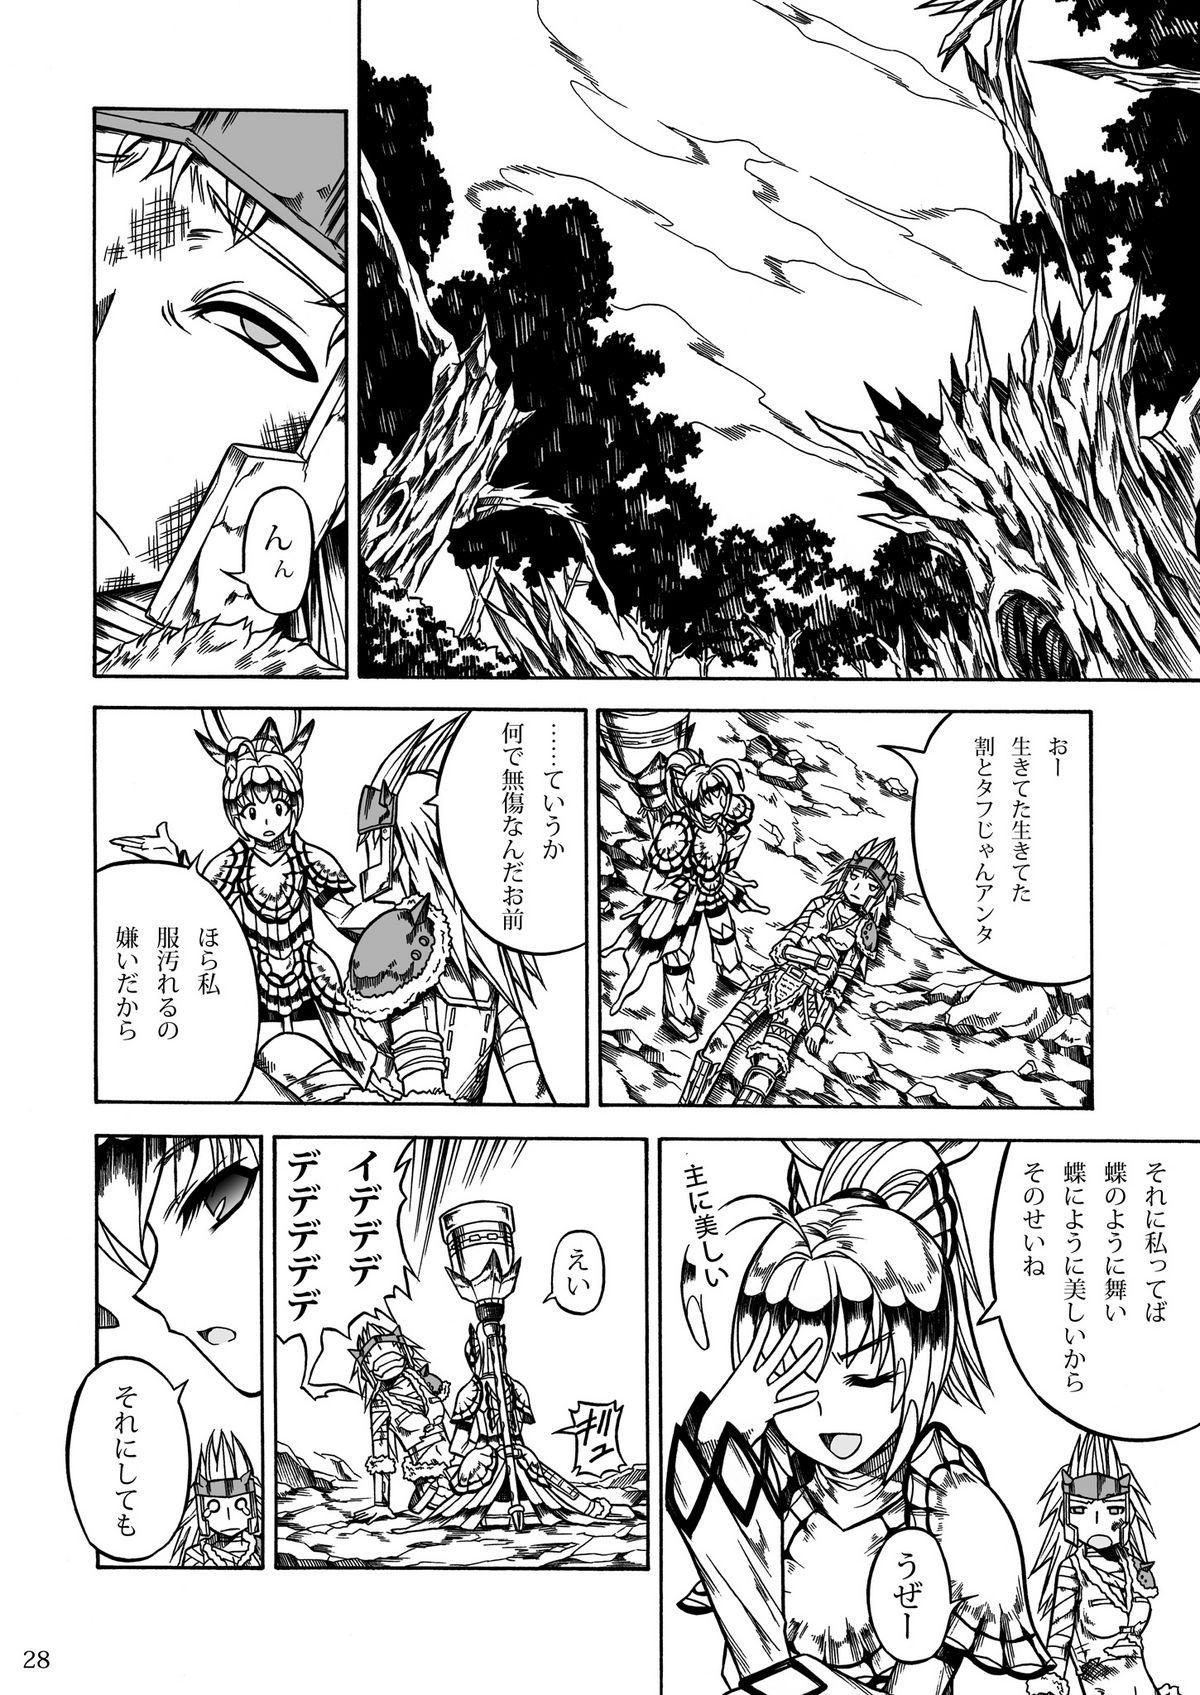 Solo Hunter no Seitai 2 The third part 27